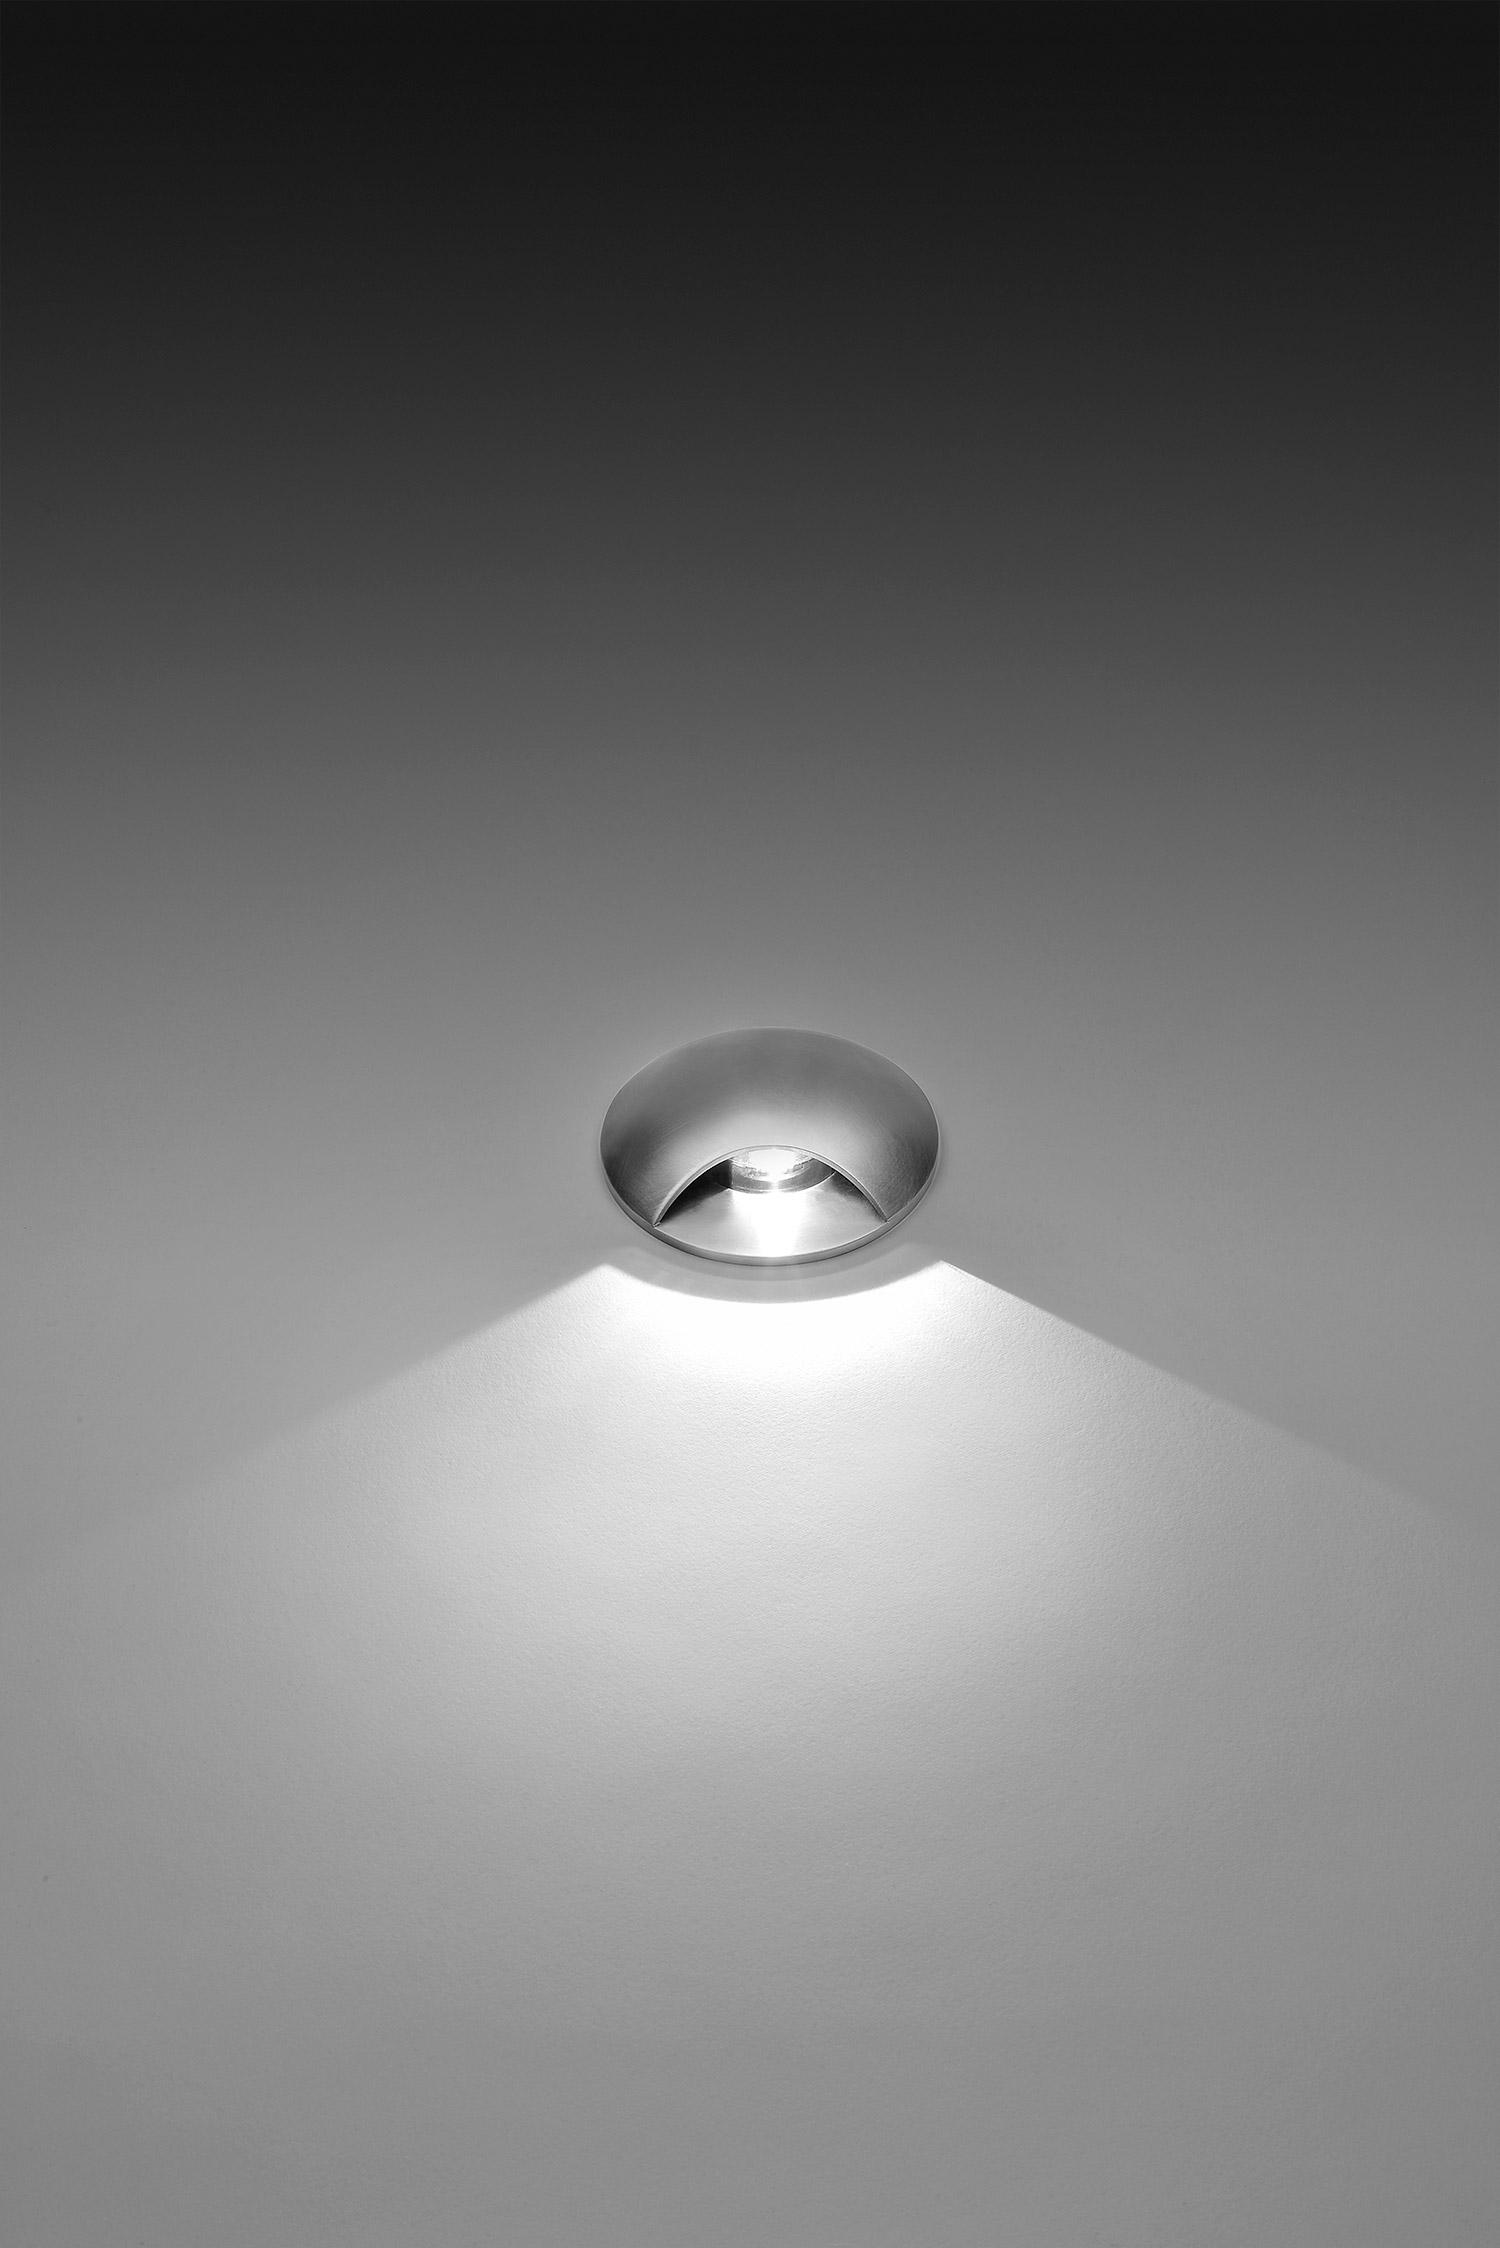 201065 HYDROFLOOR MICRO STEEL 01 LED 3W 1